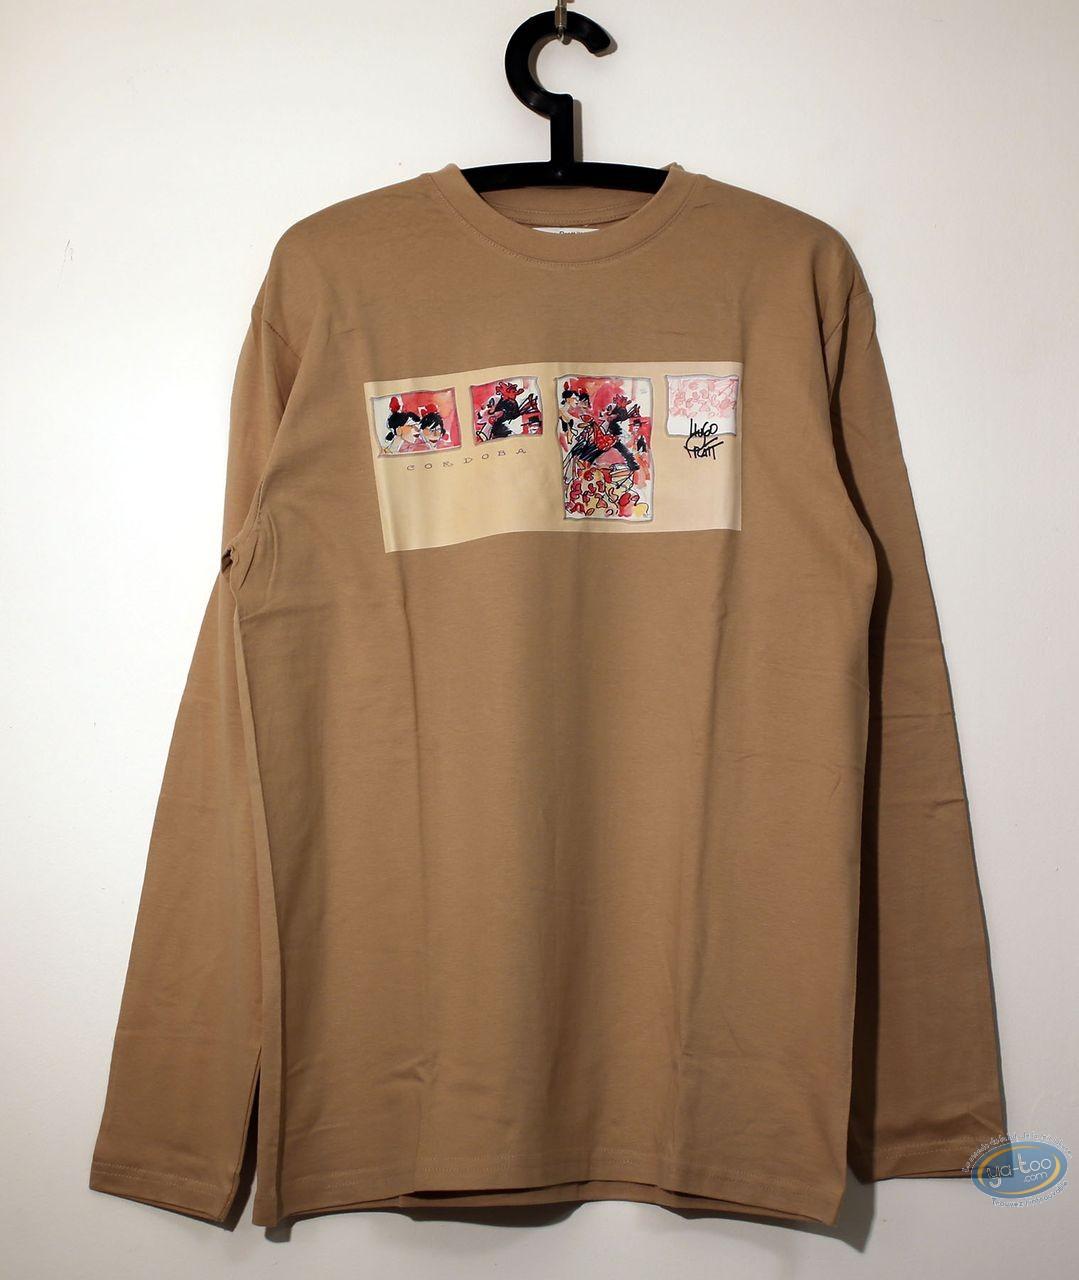 Clothes, Corto Maltese : T-shirt, Corto Maltese : Mixed Cordoba 01-02 bis size S